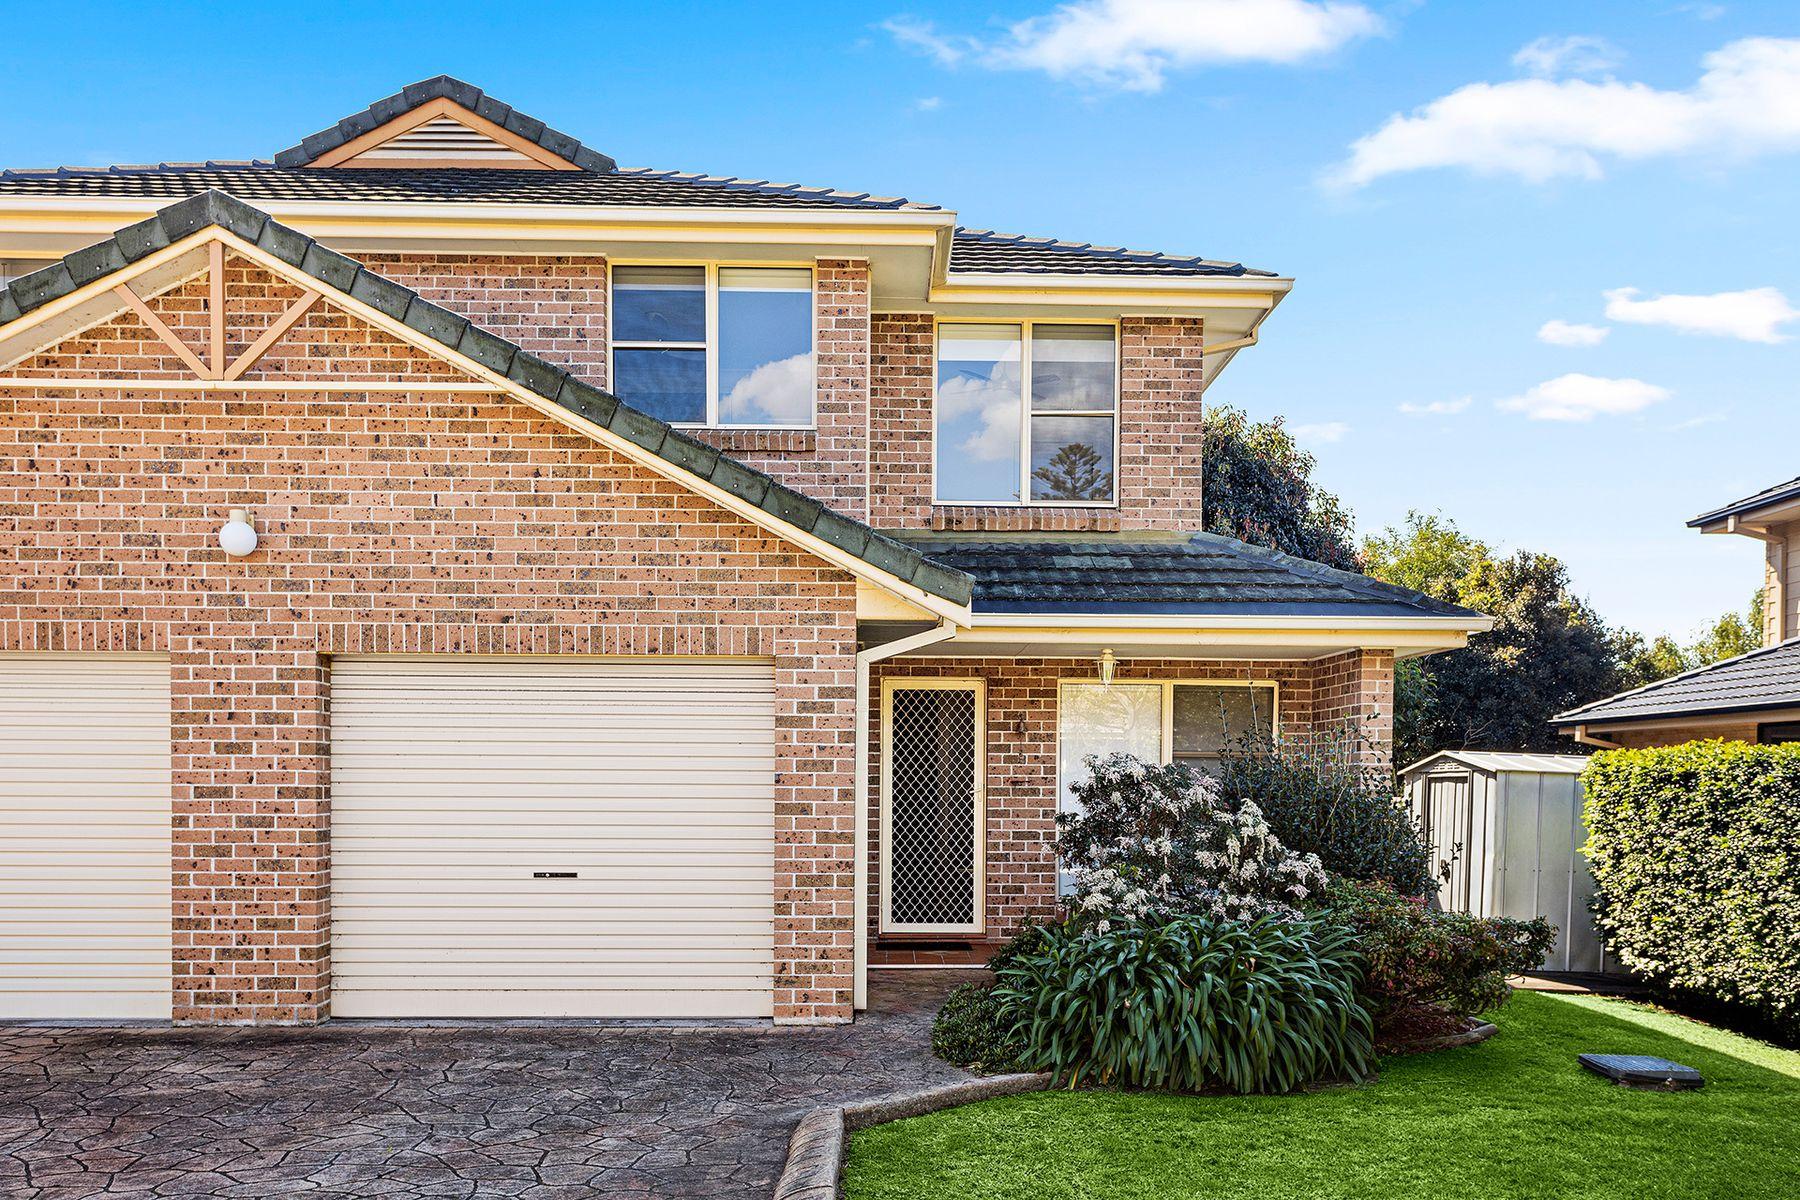 8/56-60 Duke Street, Woonona, NSW 2517